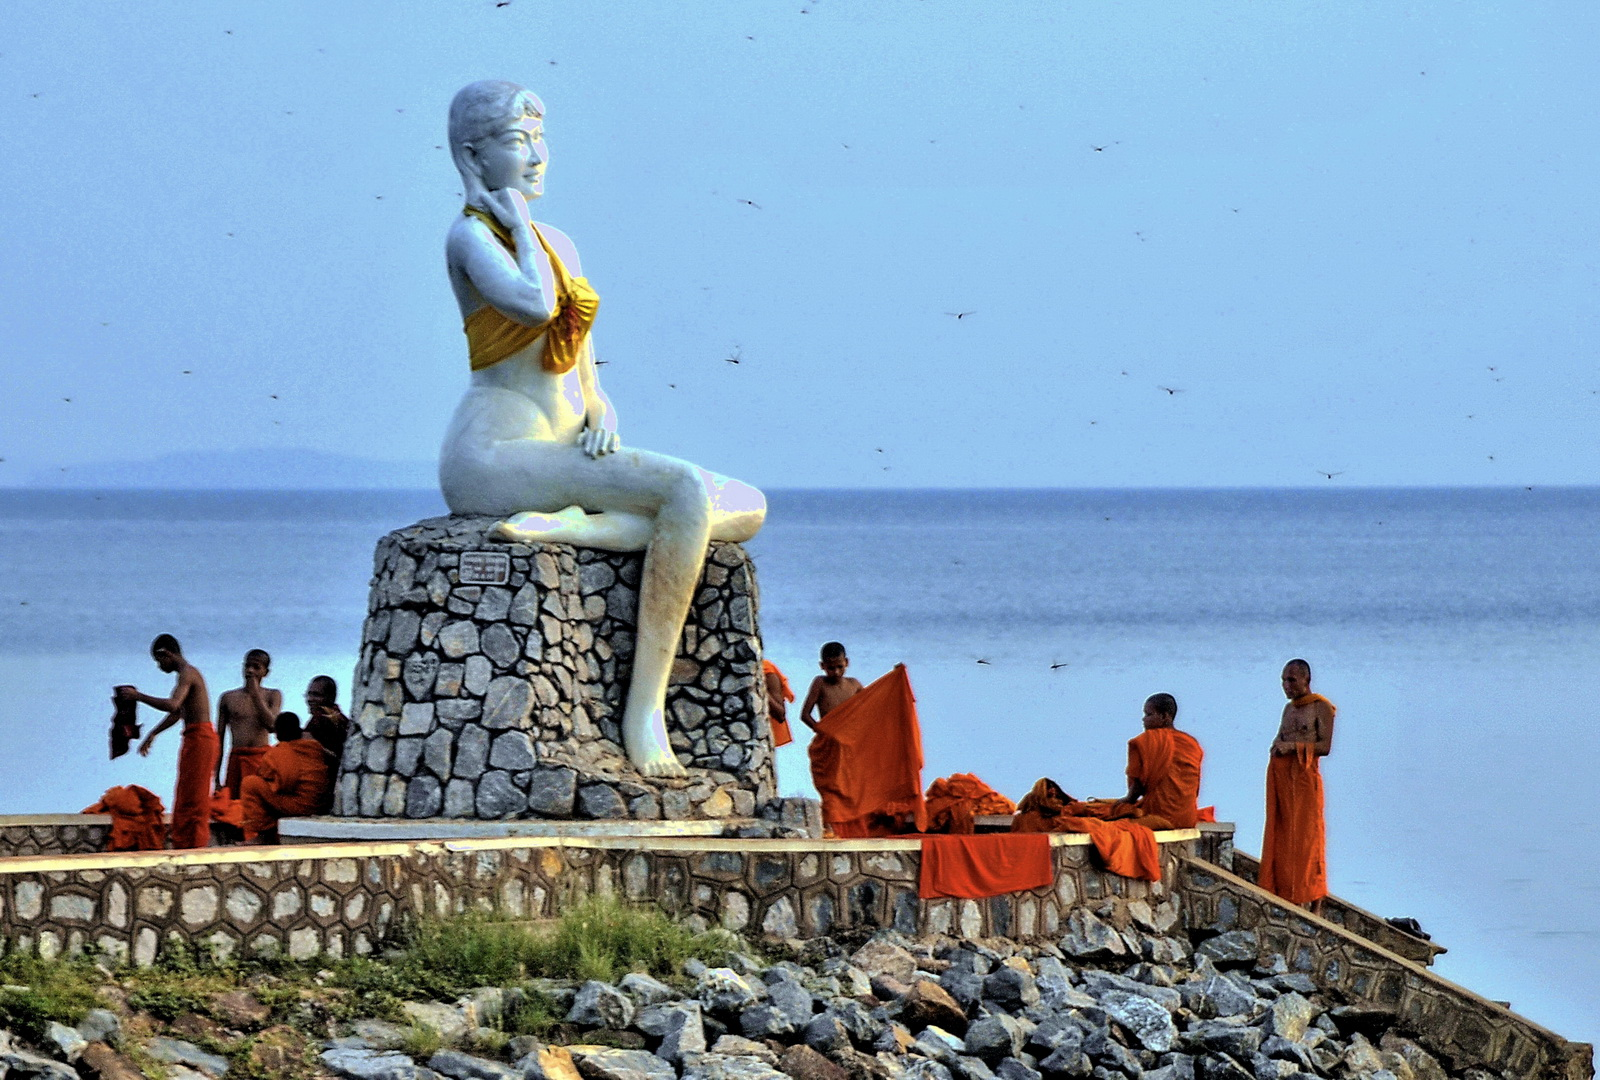 Cambodia, Kep mermaid and bathing monks